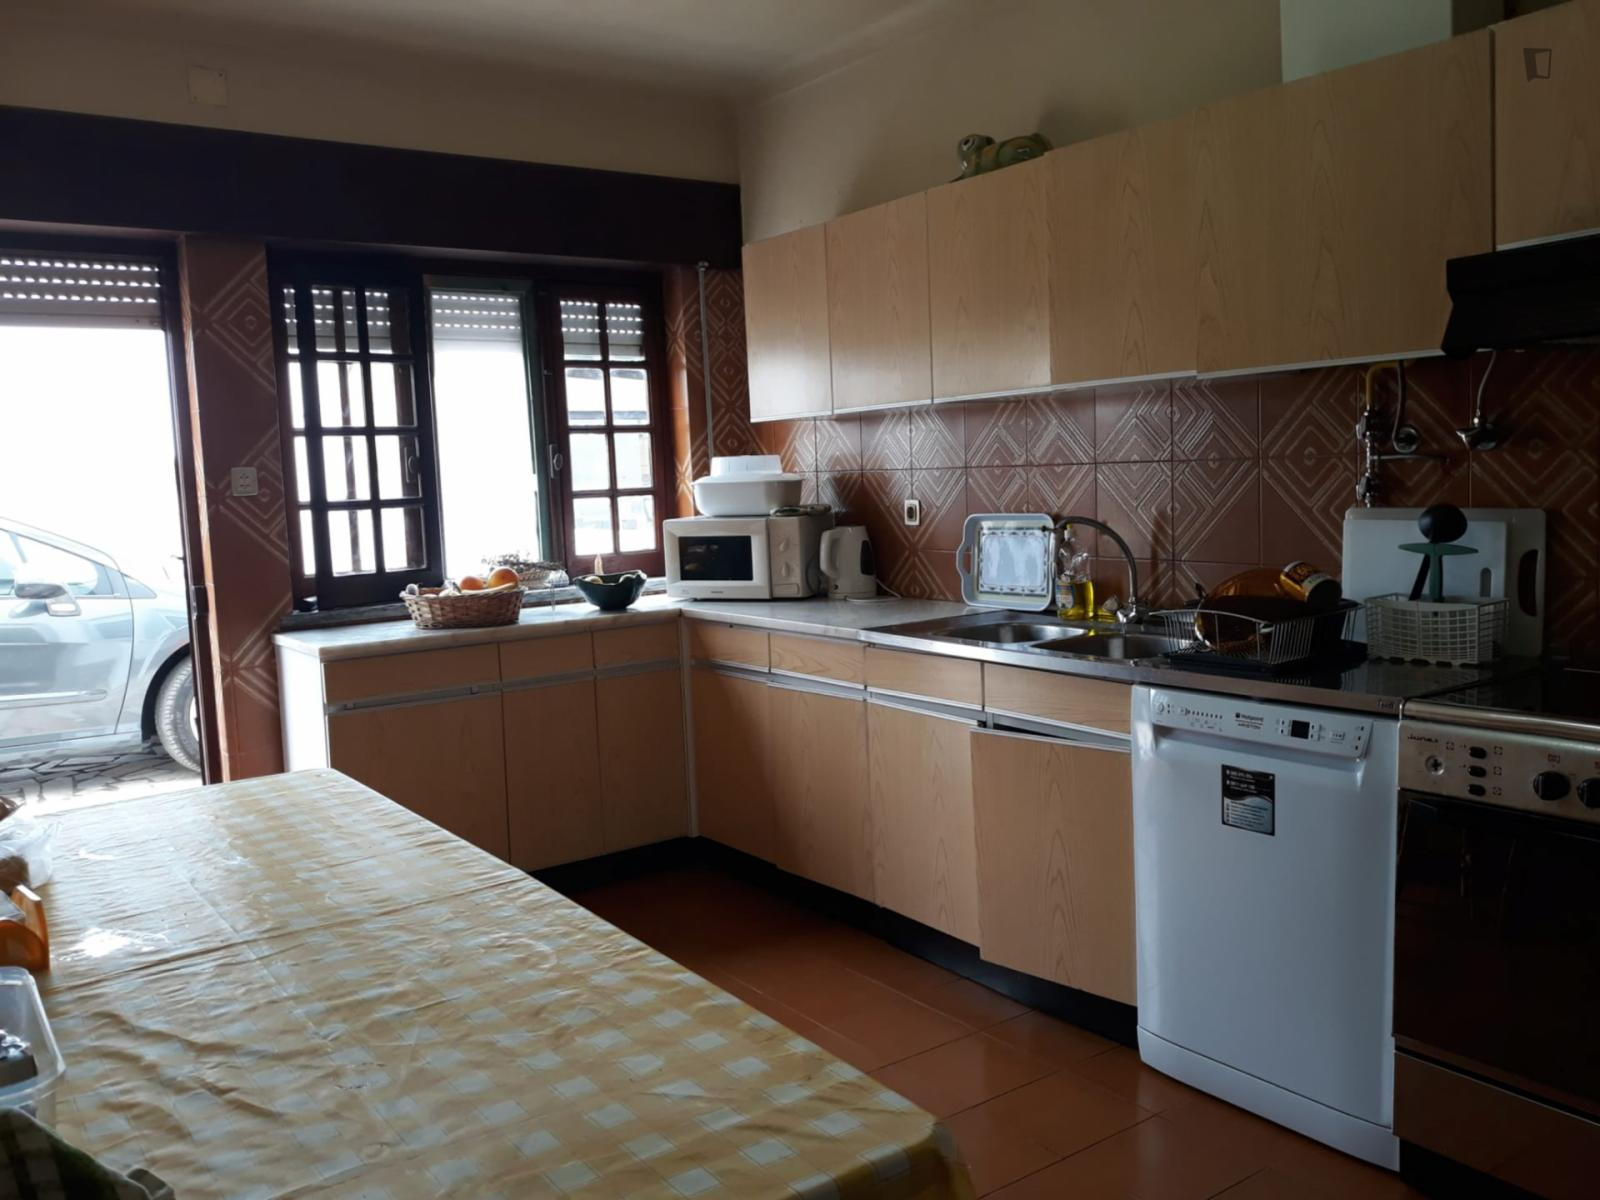 Rua Andrade, Atouguia da Baleia, PT-10 - 600 EUR/ month